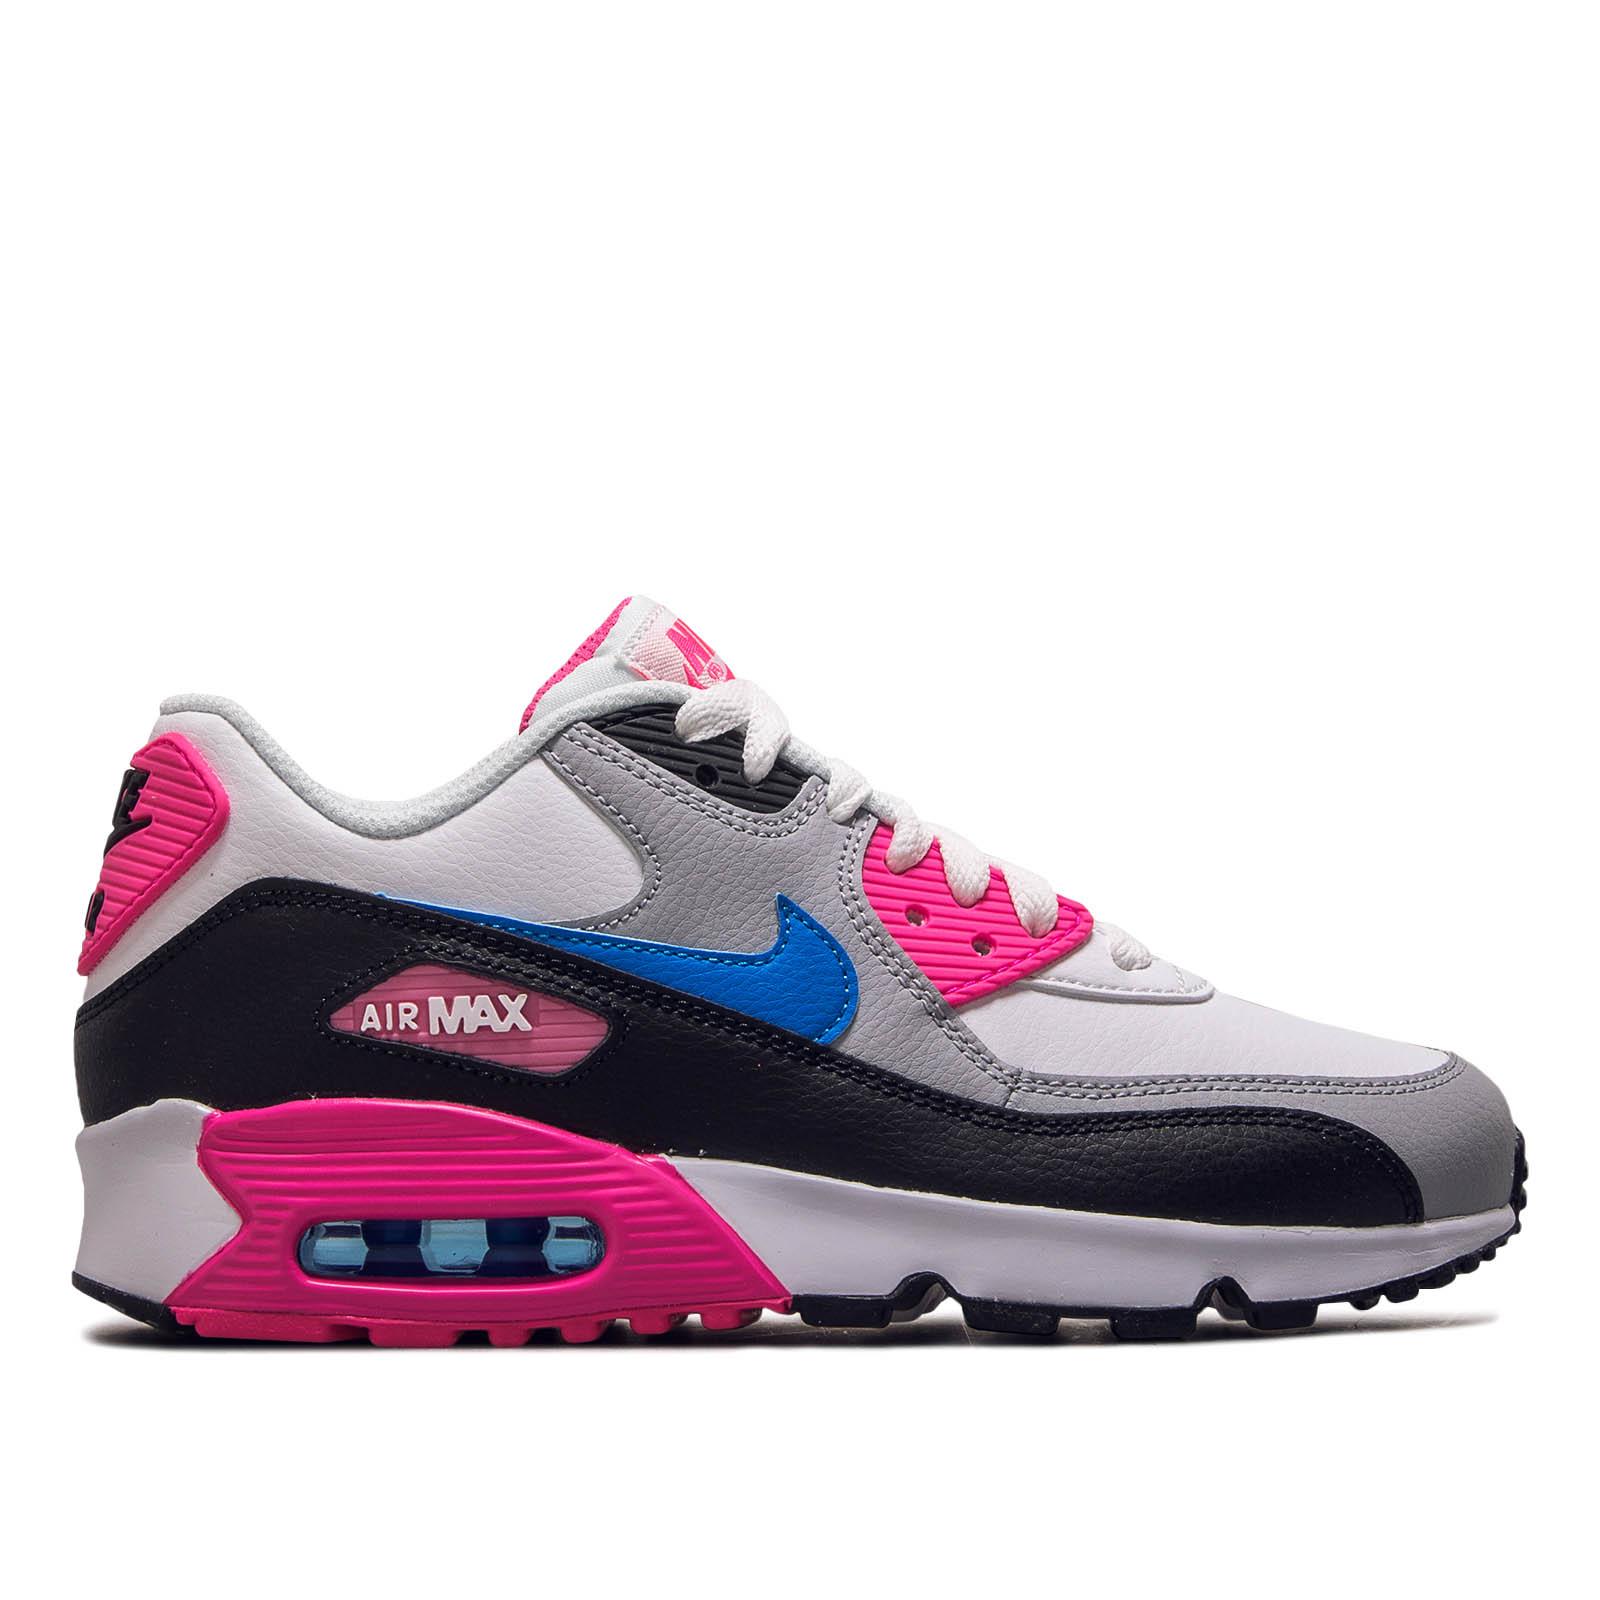 b46fb644d9 bunten Damen Sneaker von Nike online kaufen | BodycheckSneaker | Frauen |  Schuhe | Bodycheck